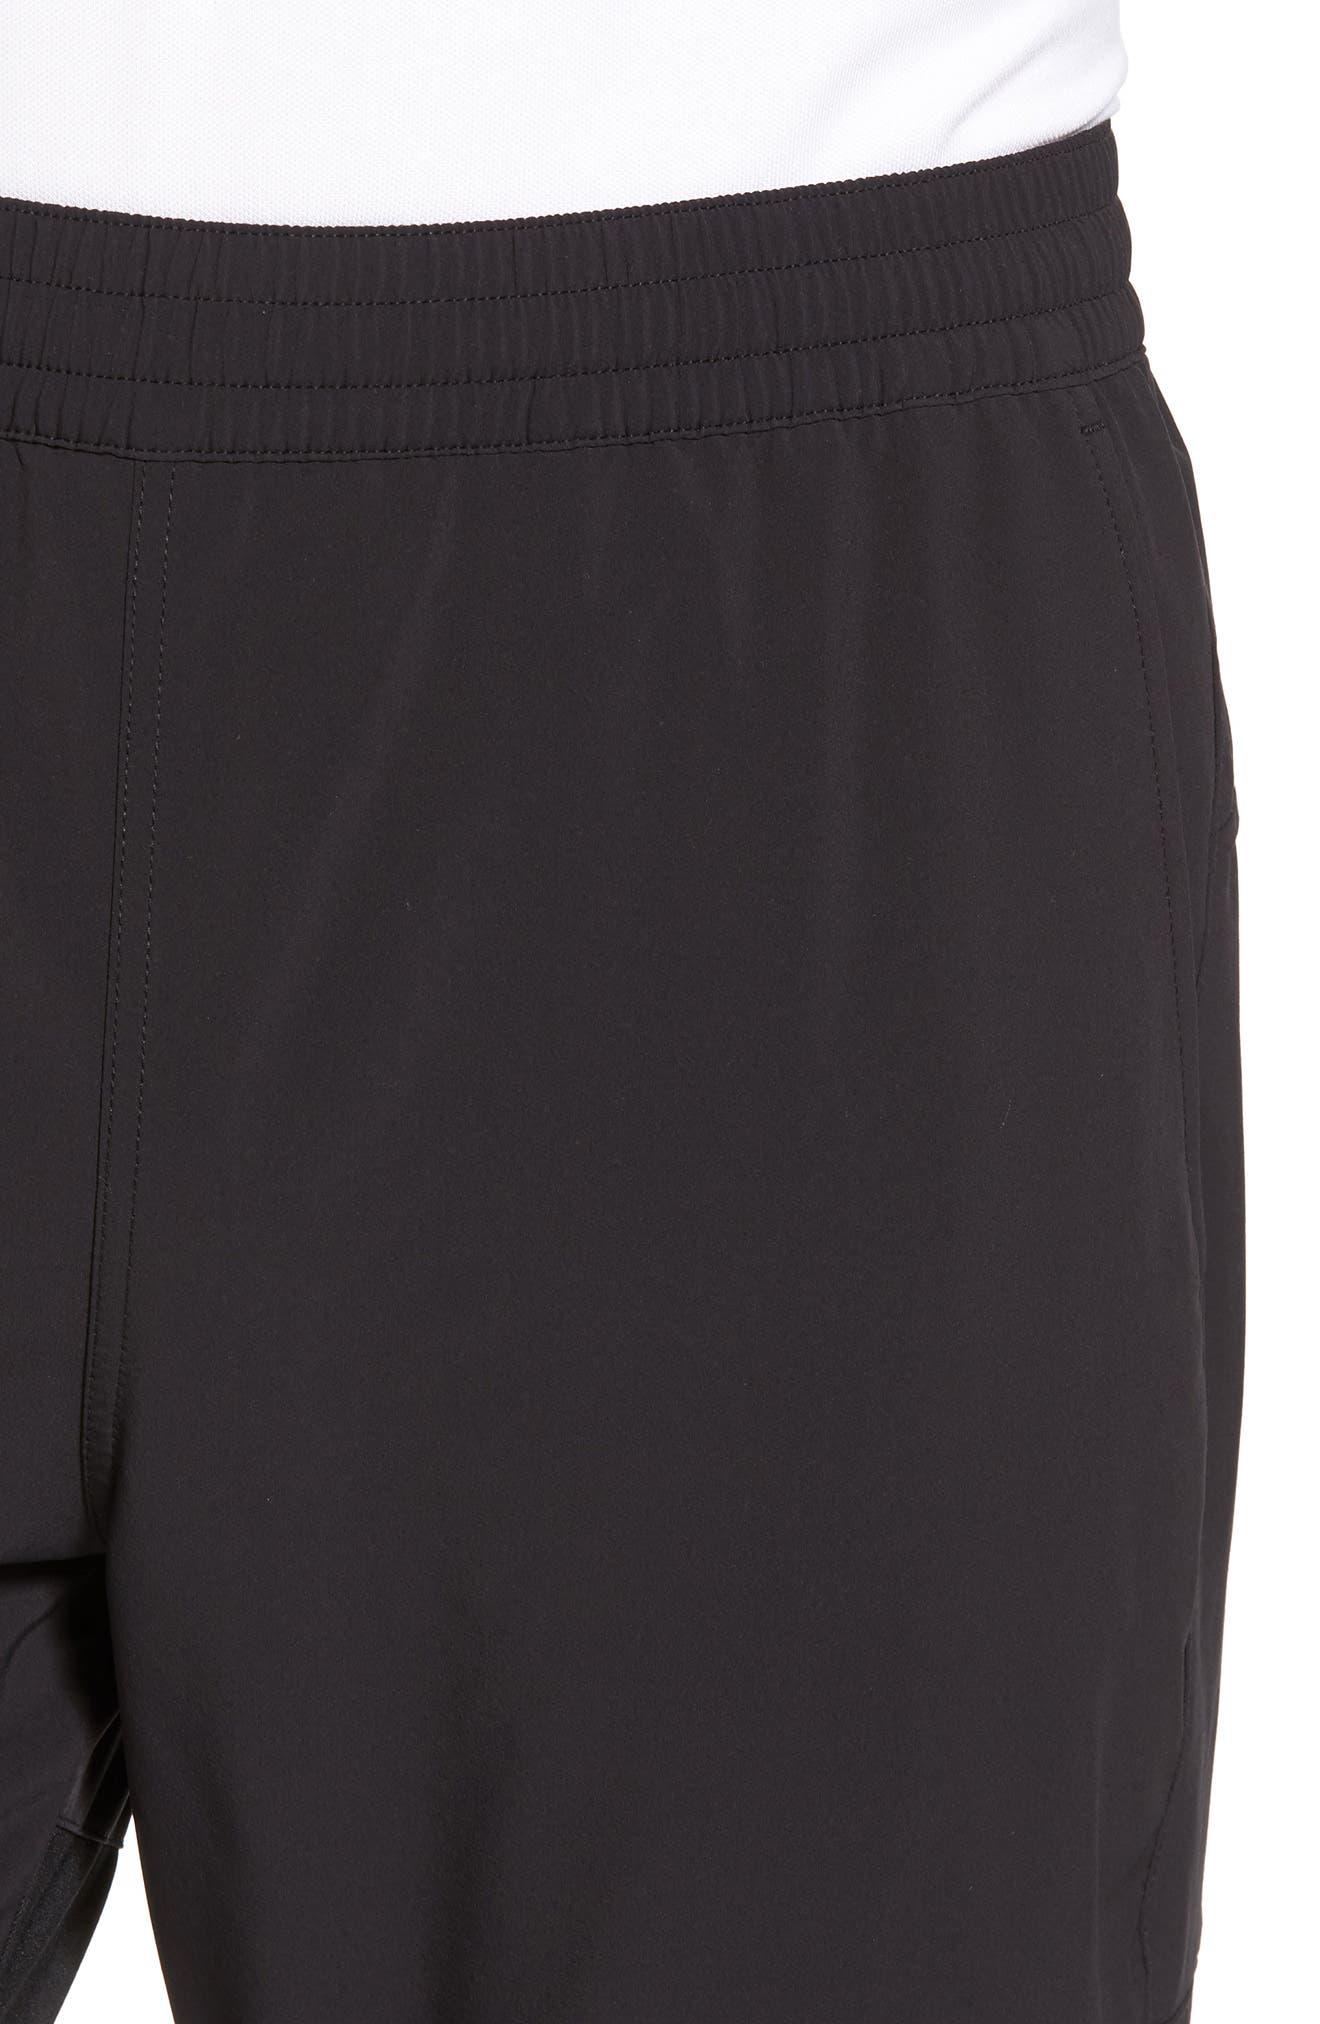 Graphite Tapered Athletic Pants,                             Alternate thumbnail 4, color,                             Black